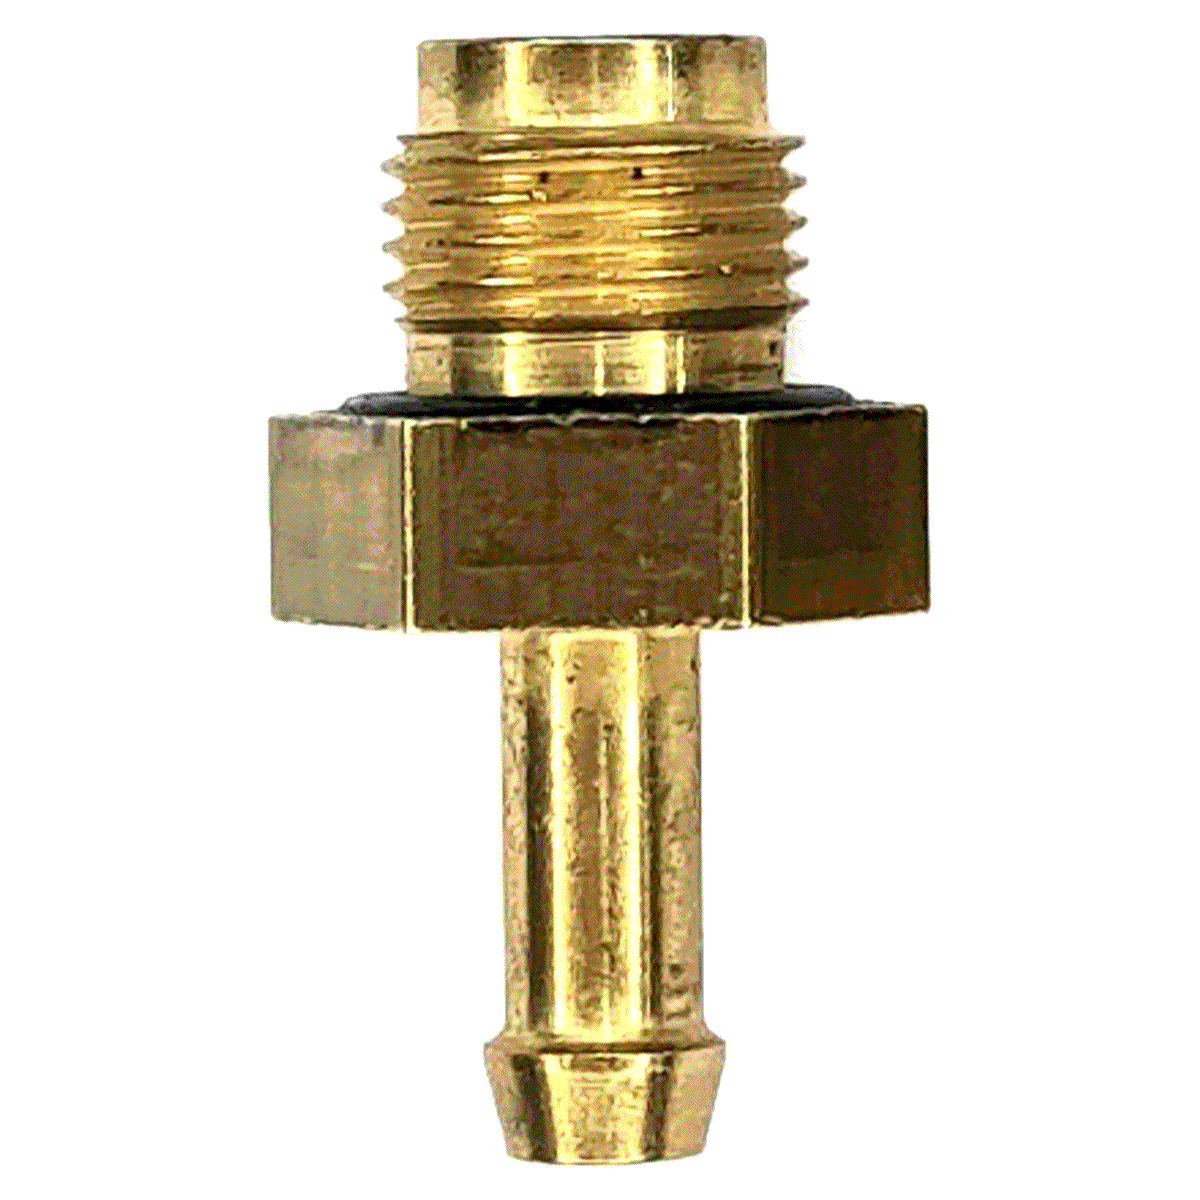 Gicleur 1,6mm da rampa de bico tury stag valtek